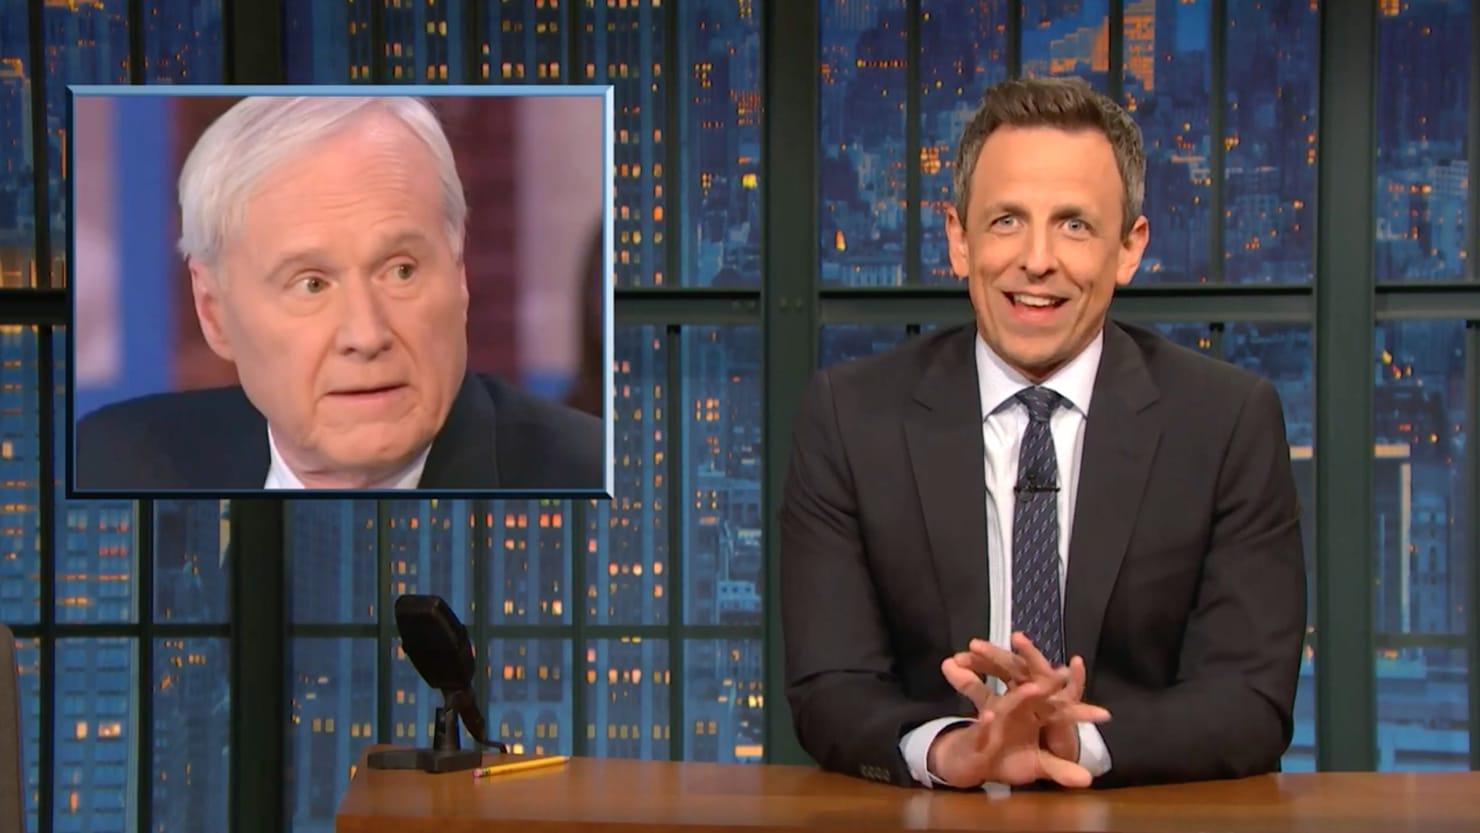 Seth Meyers Unloads on Chris Matthews for 'Deranged' Bernie Sanders Attacks